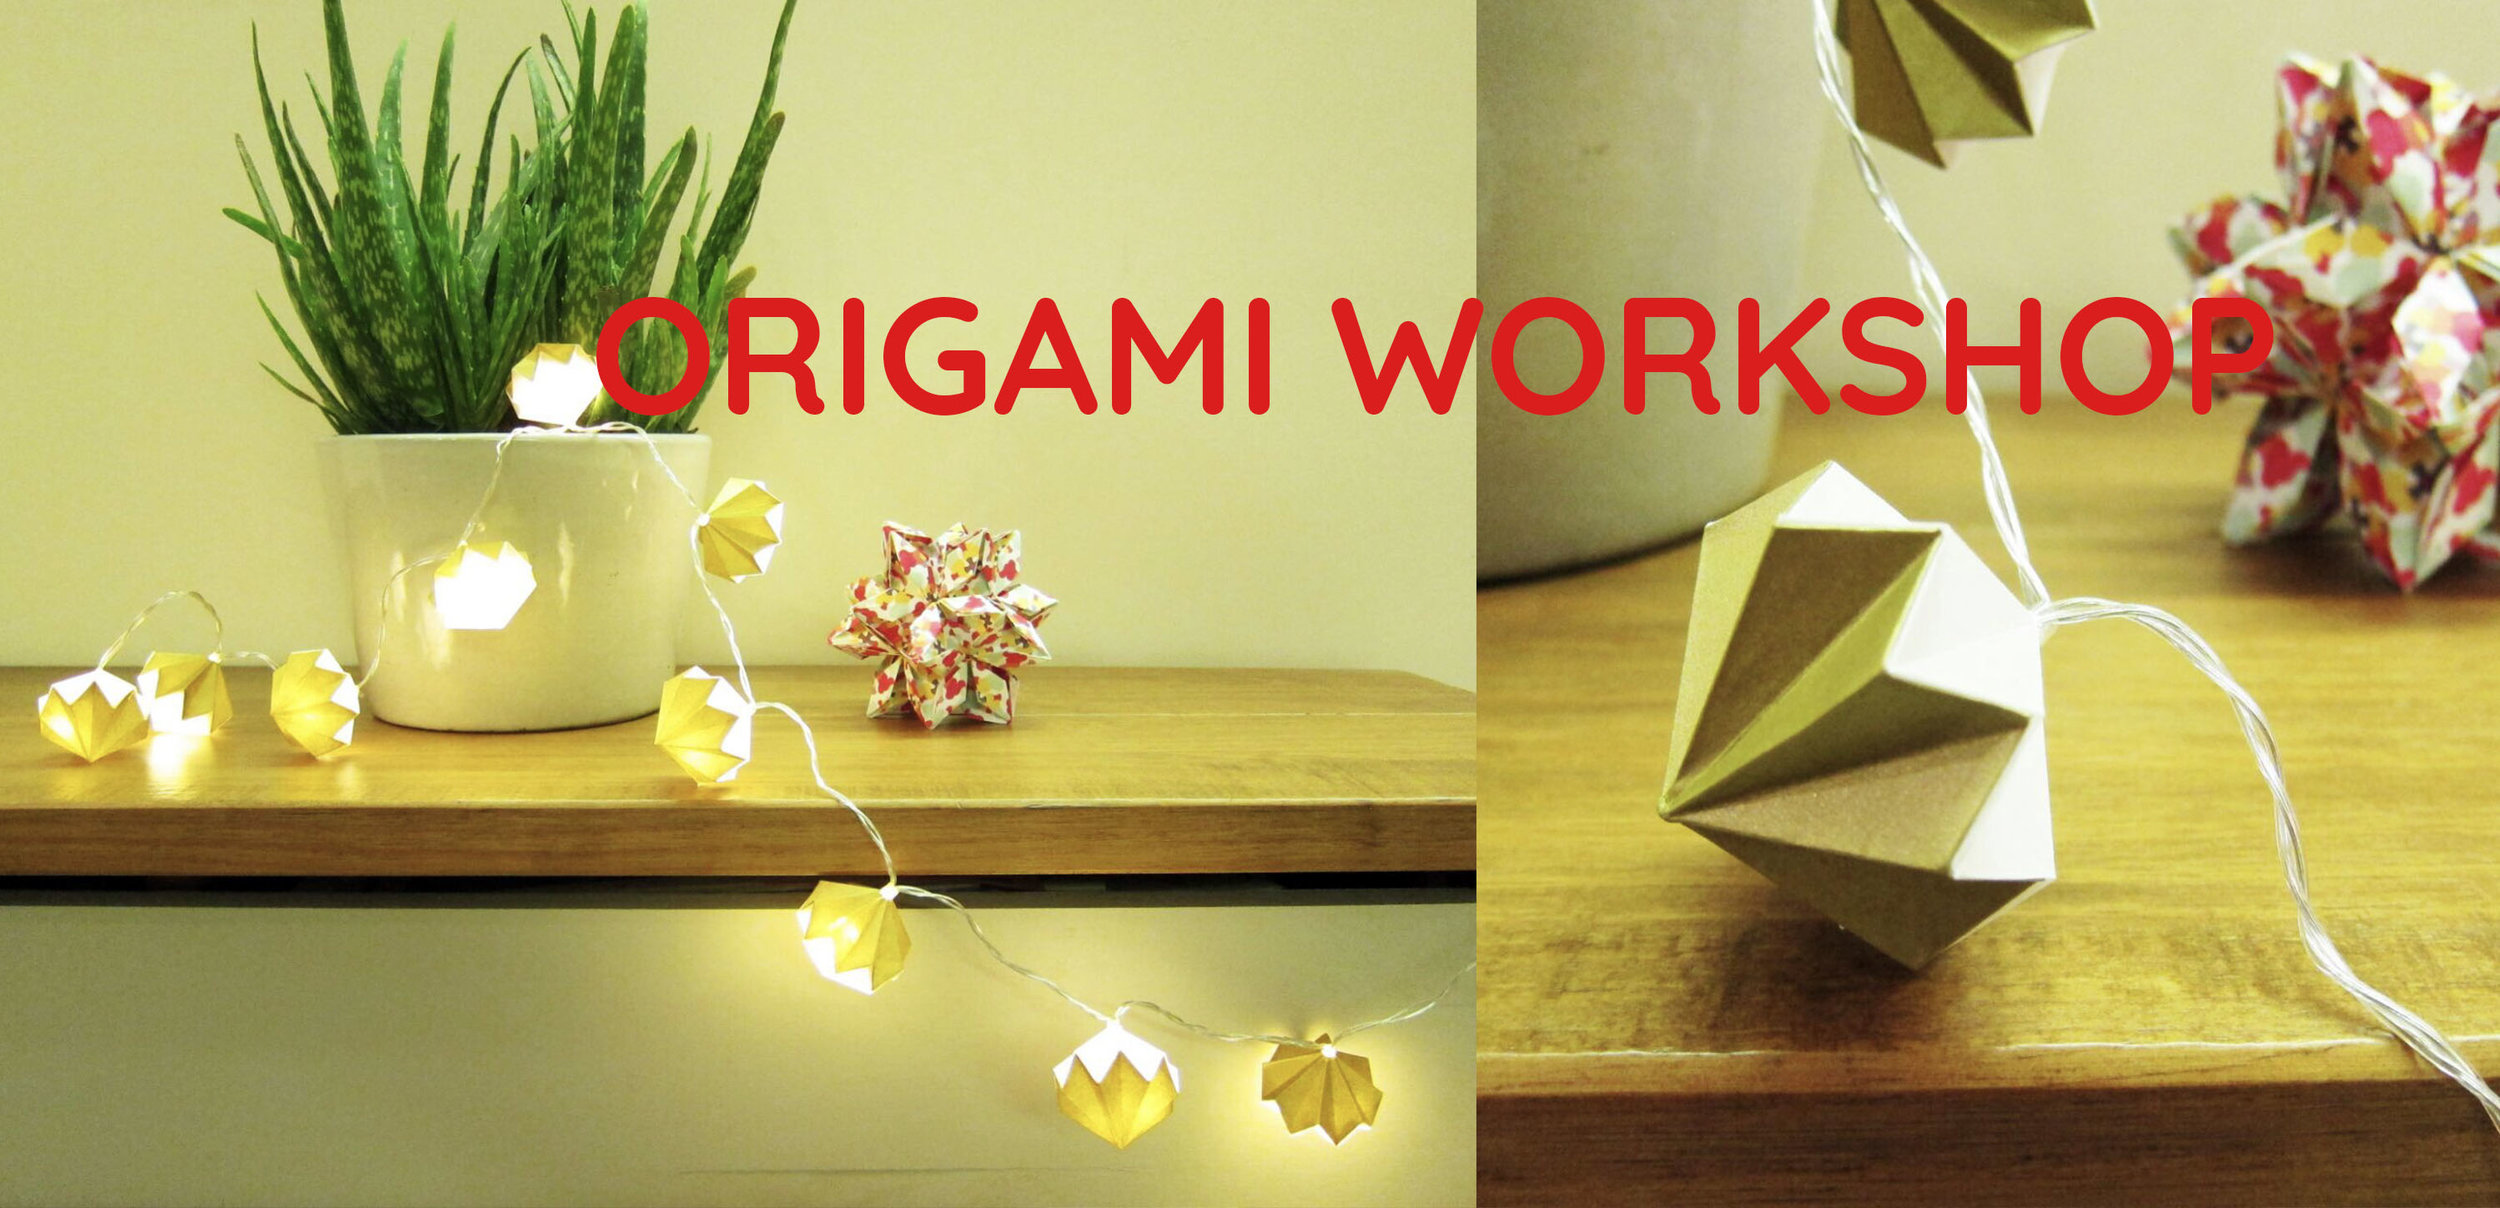 ORIGAMI FACEBOOK.jpg